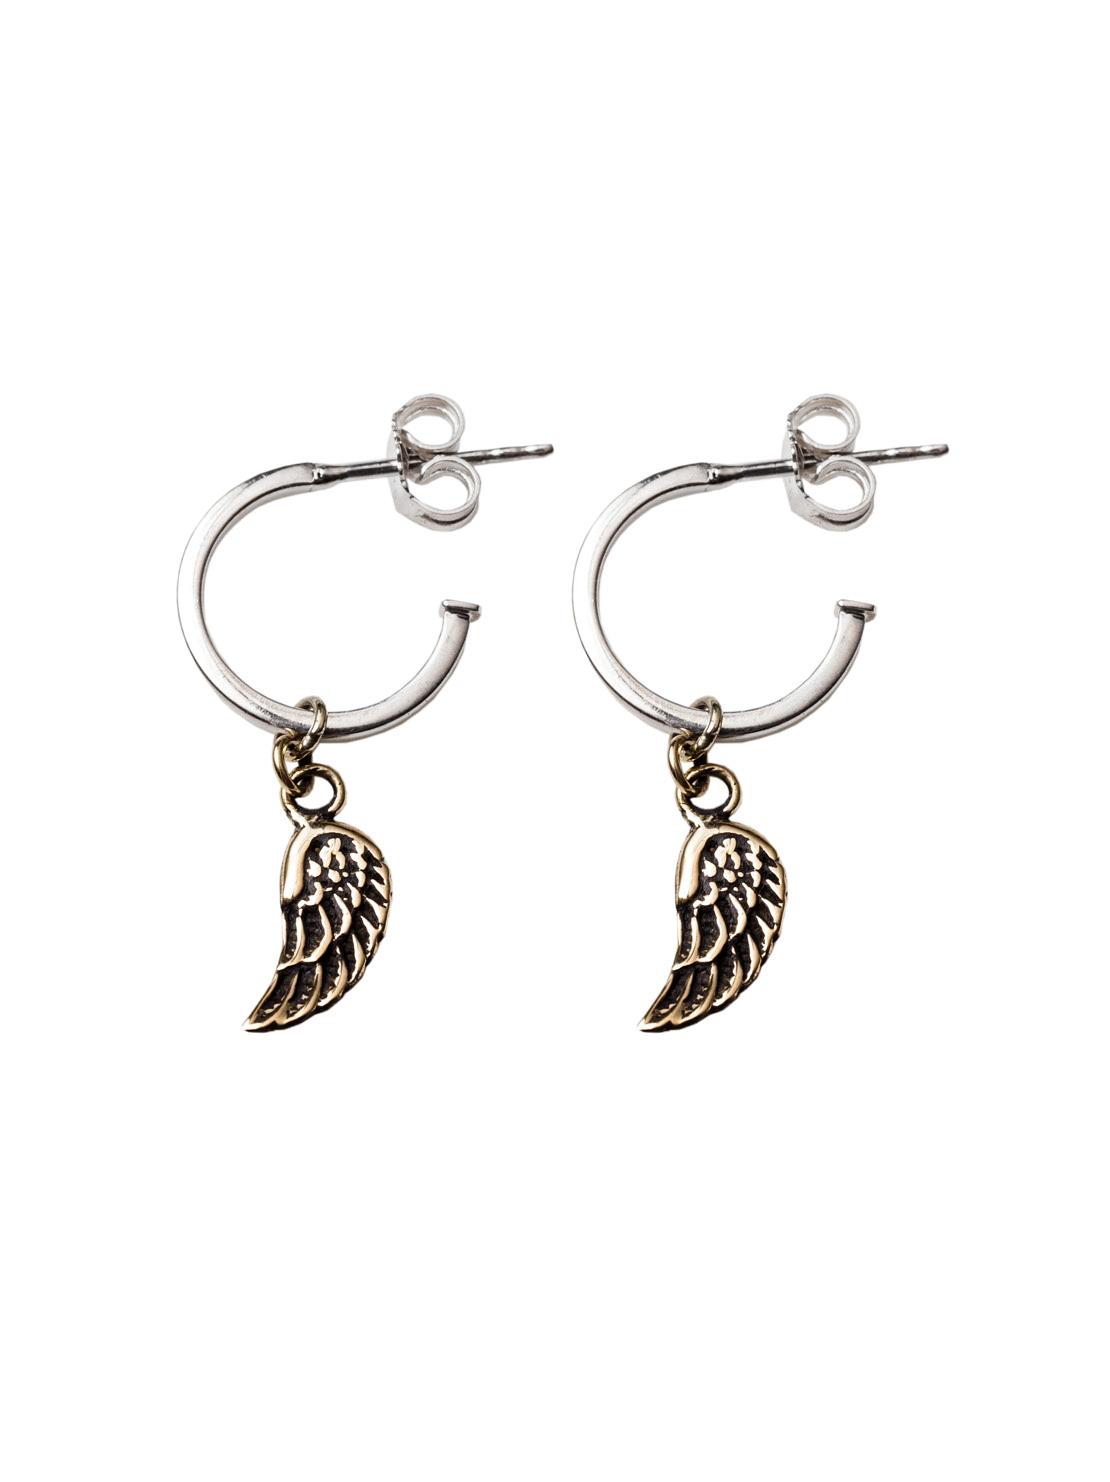 Silver Hoop Earrings With Brass Wings